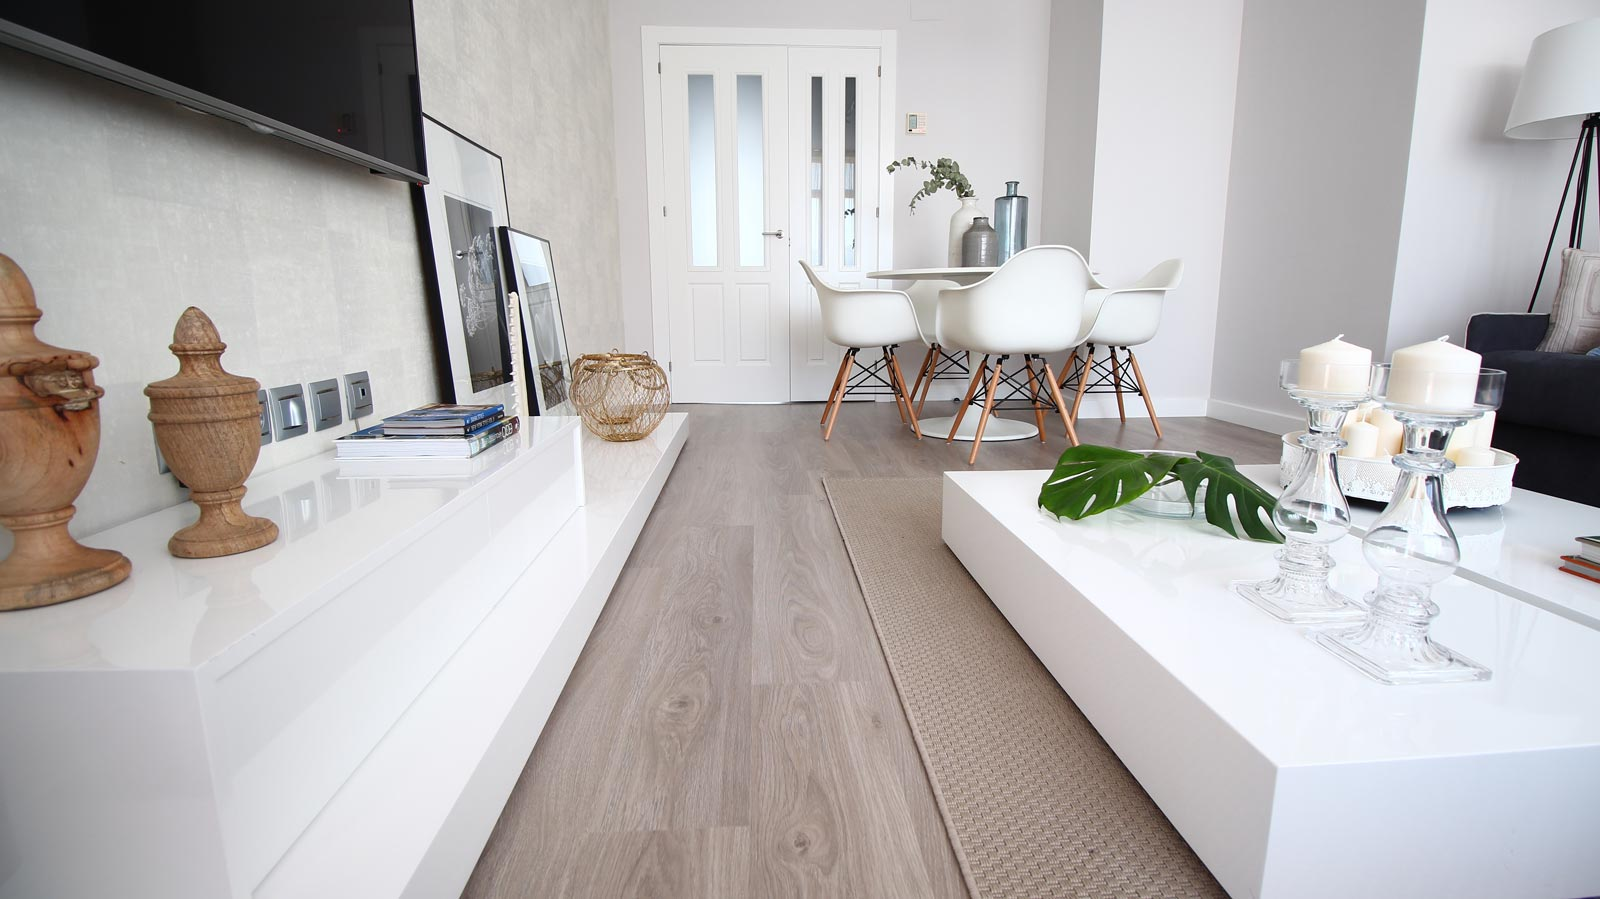 Apartamentos con encanto en Málaga